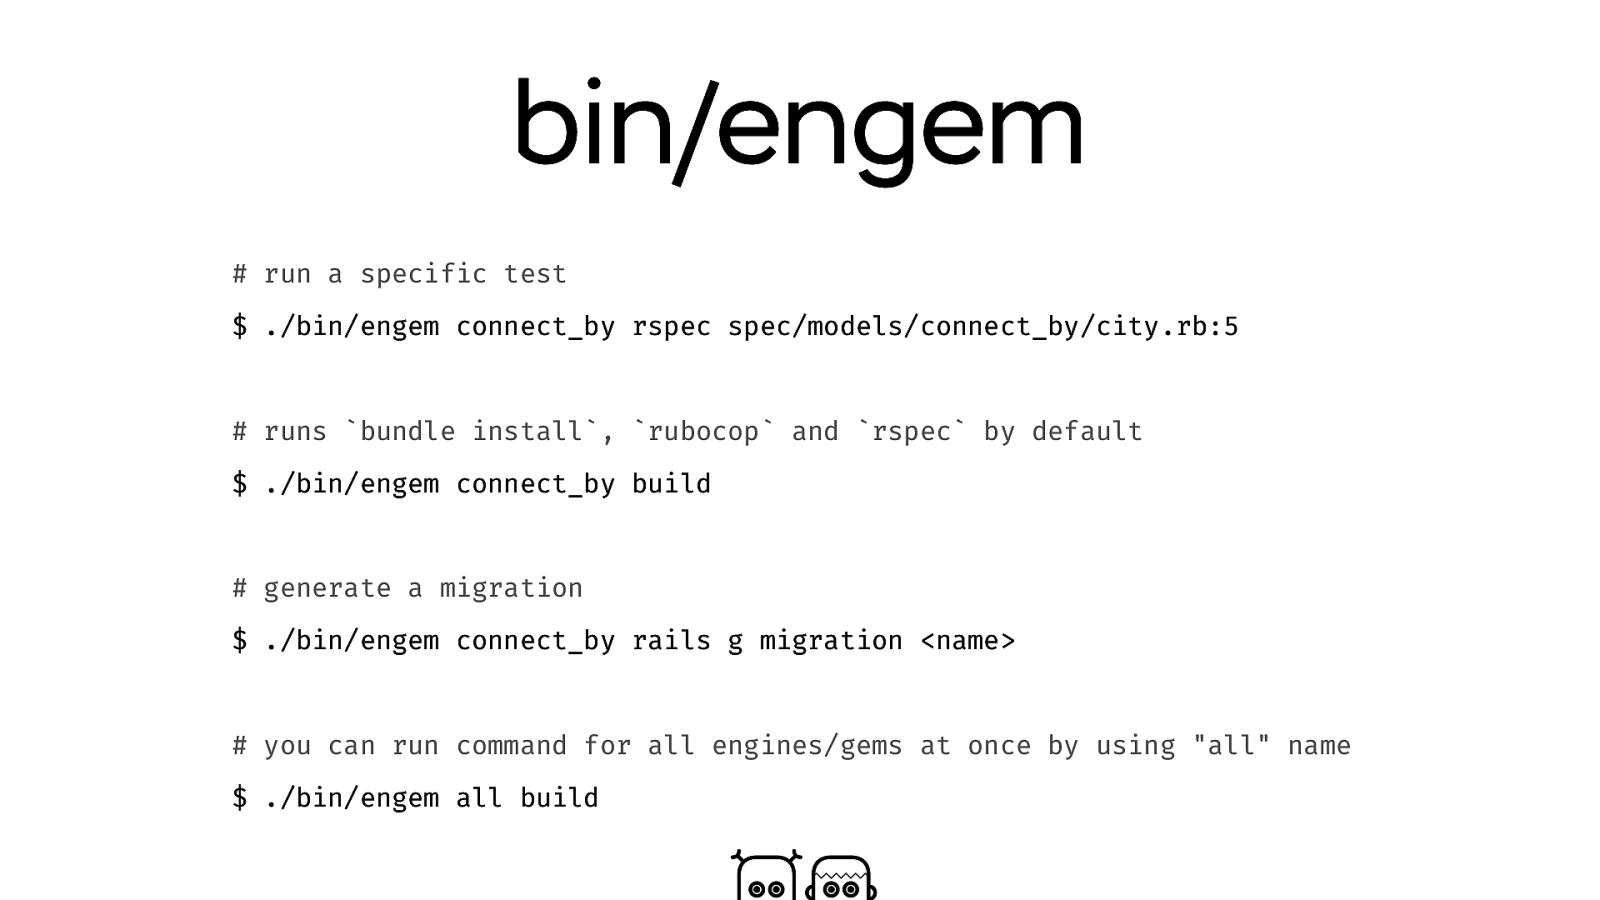 Engine-ering Rails apps